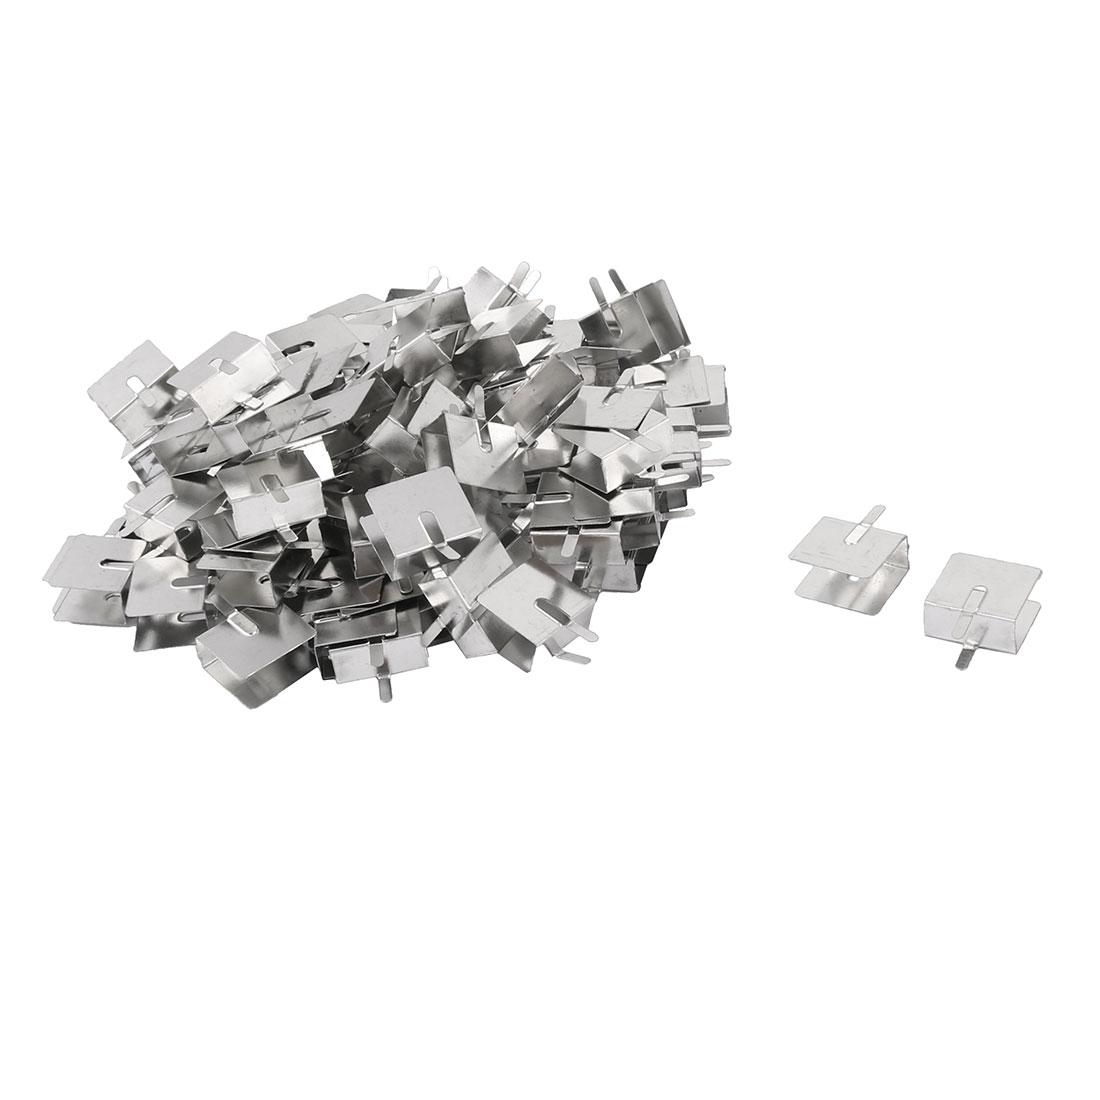 18mmx20mmx10mm PCB Mounting Aluminium Heat Diffuse Heatsink Cooling Fin 102pcs